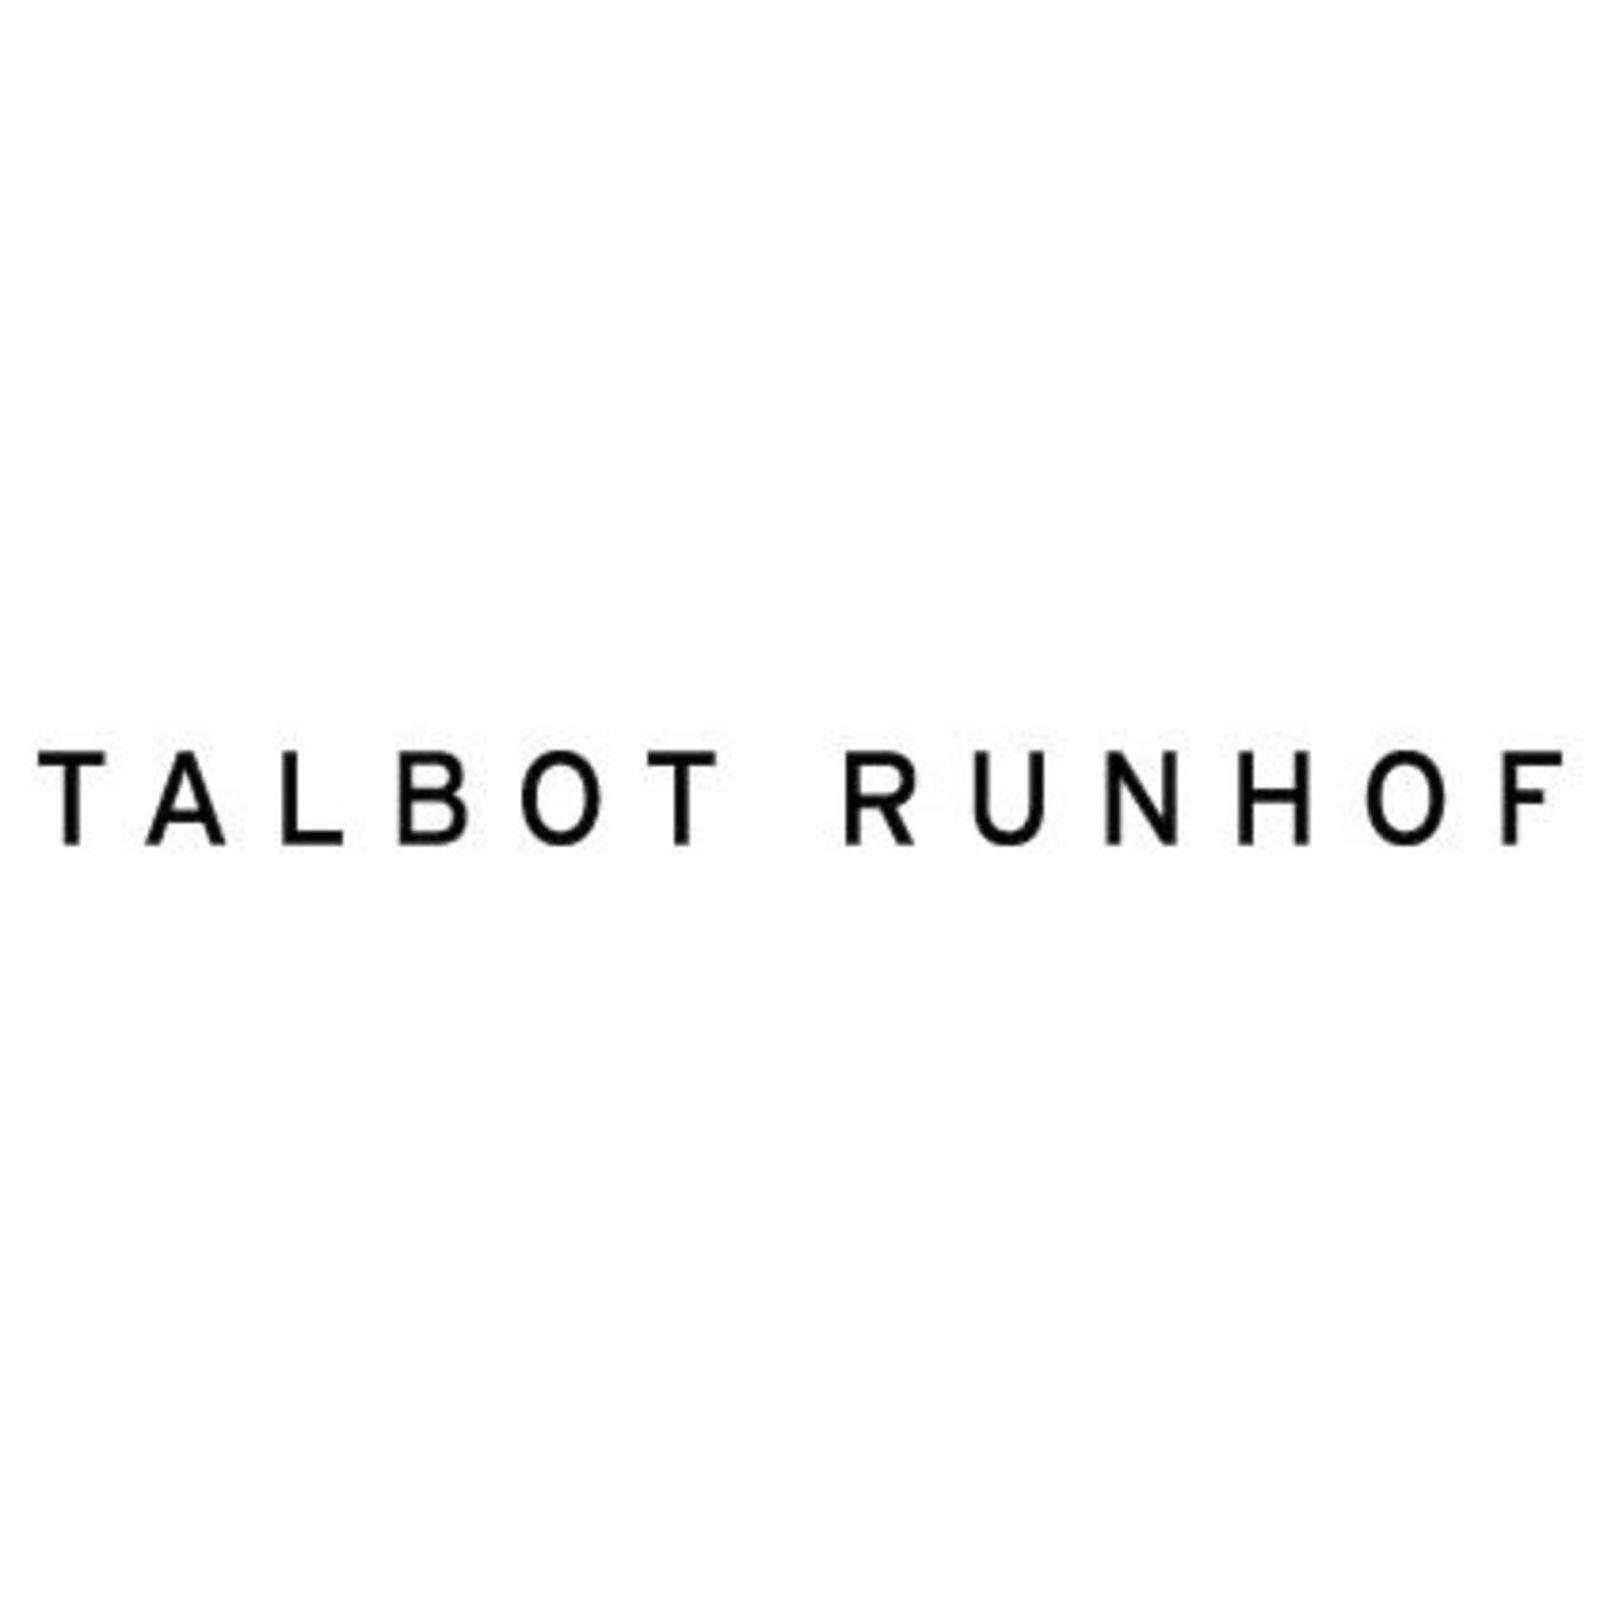 TALBOT RUNHOF (Image 1)